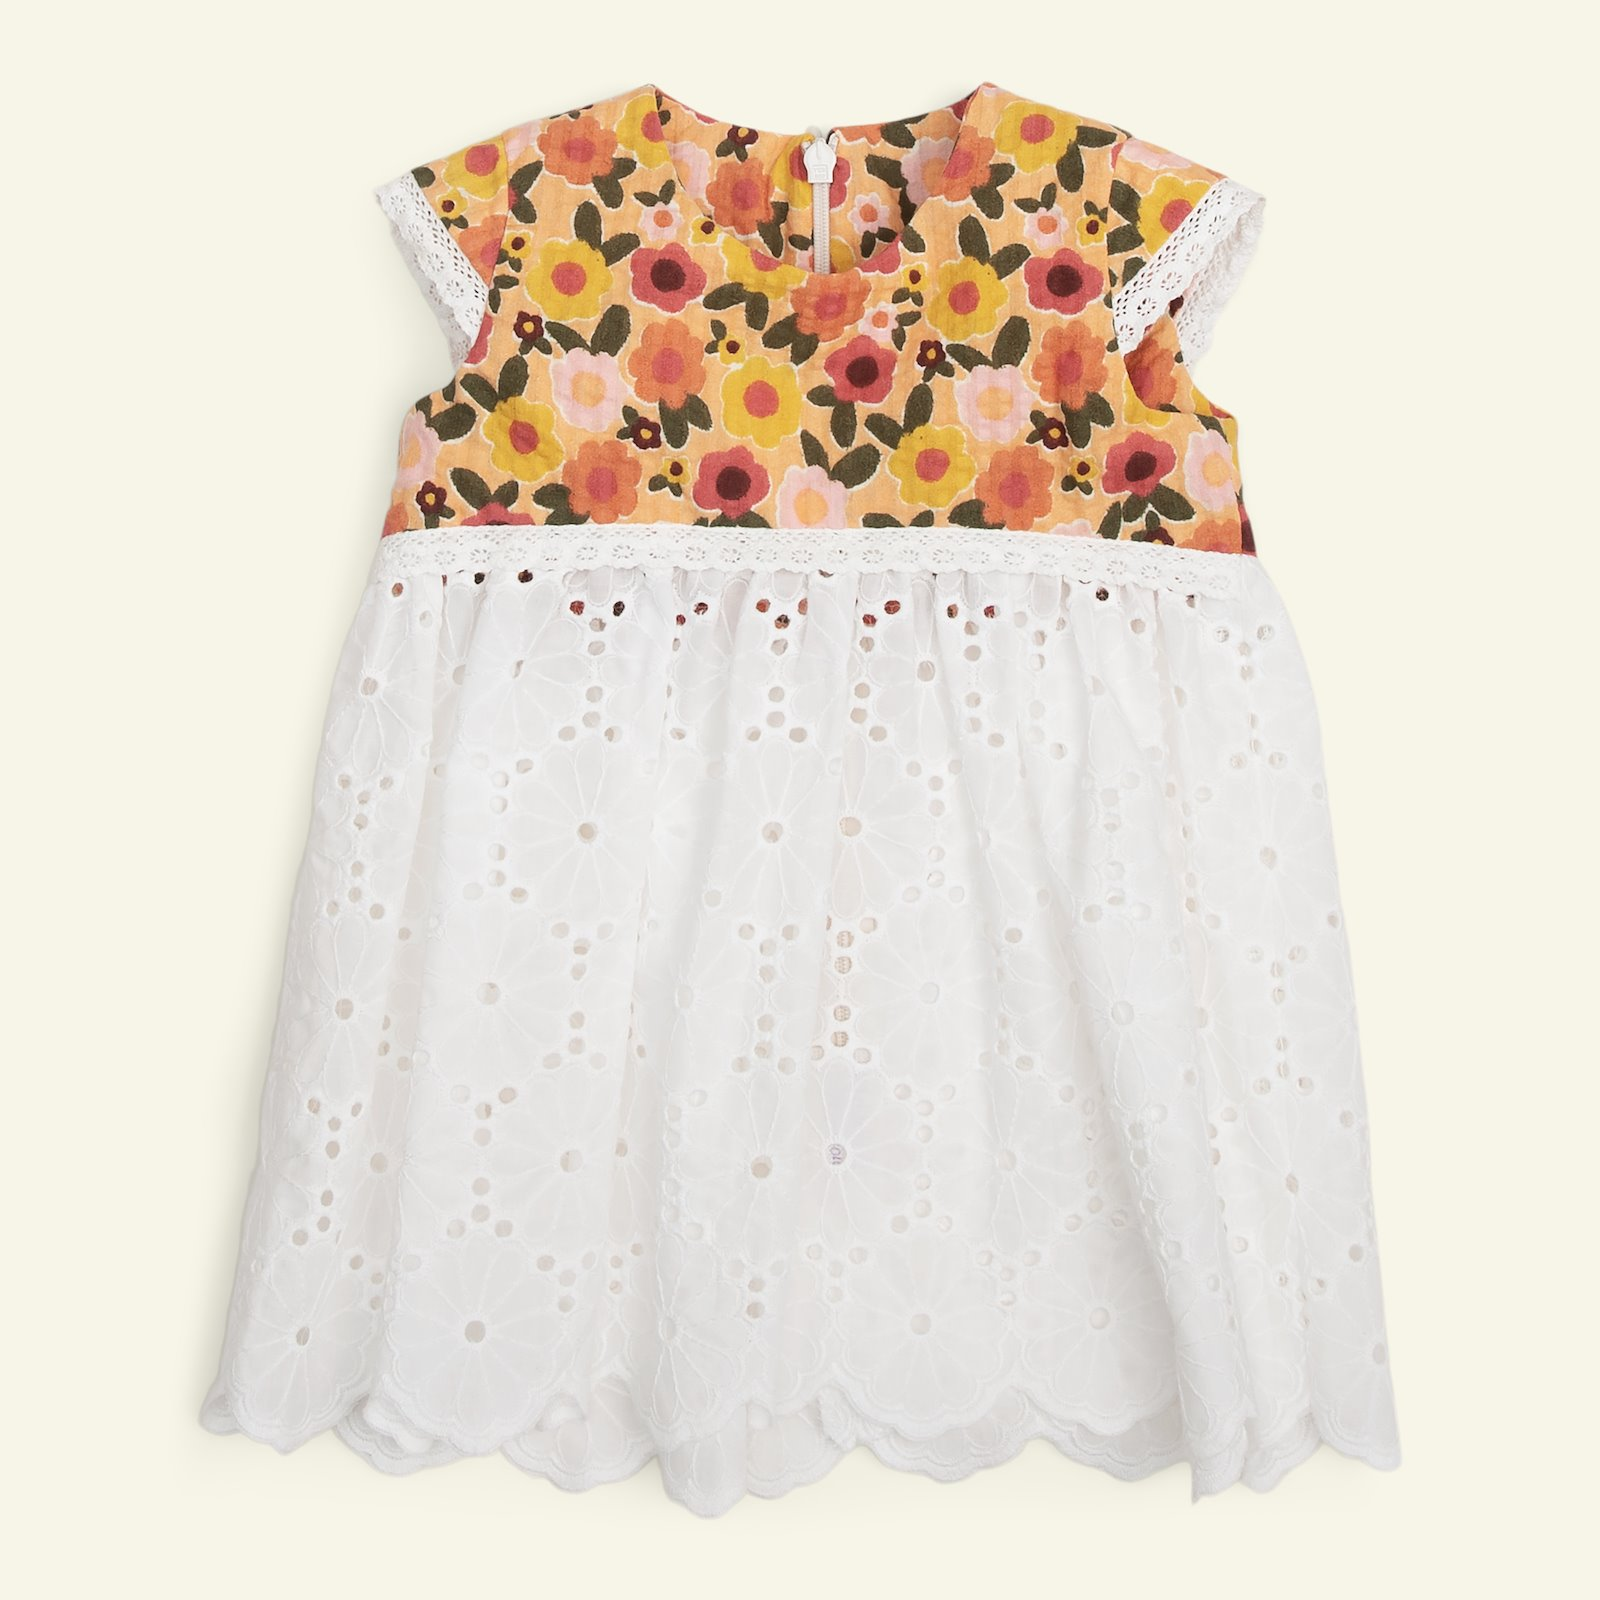 Dress, 86/1,5y p83014_580056_550105_25145_sskit